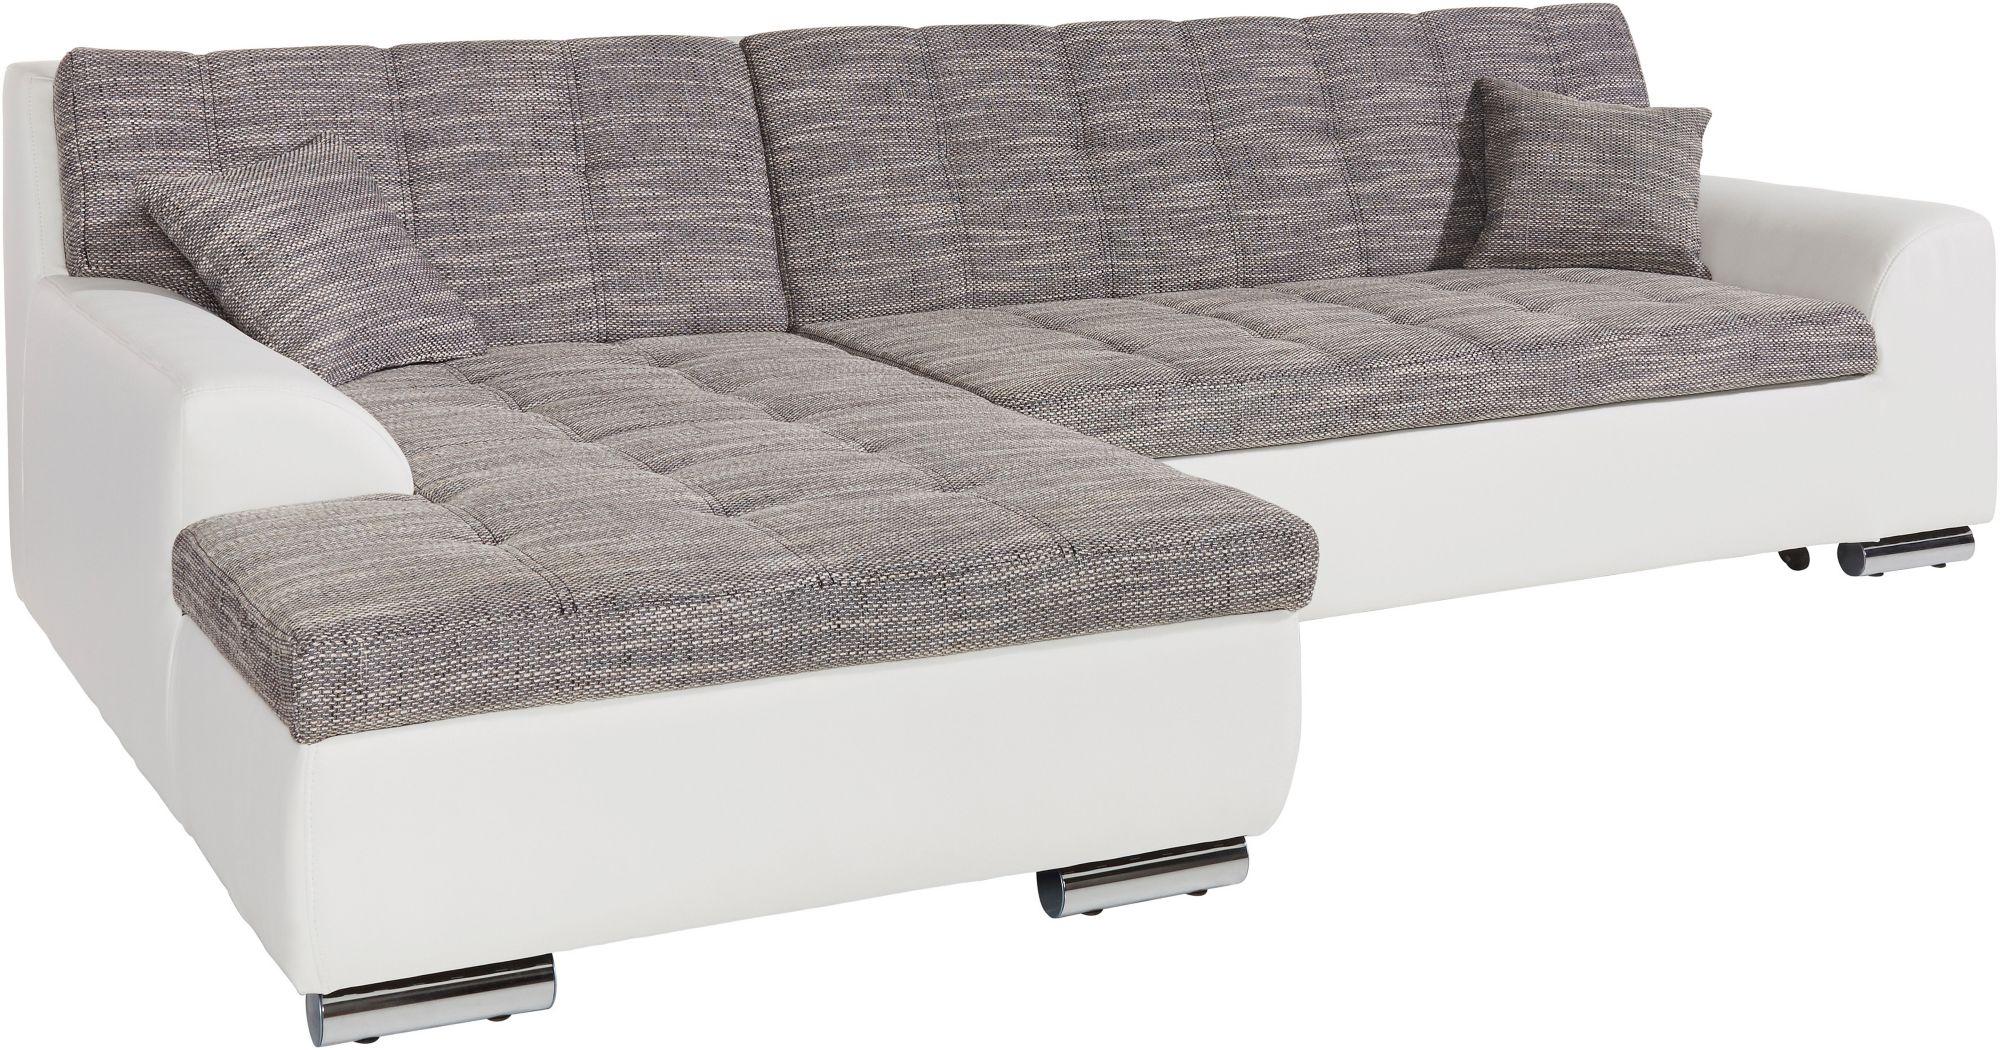 xxl polsterecke wahlweise mit bettfunktion schwab versand polsterm bel. Black Bedroom Furniture Sets. Home Design Ideas